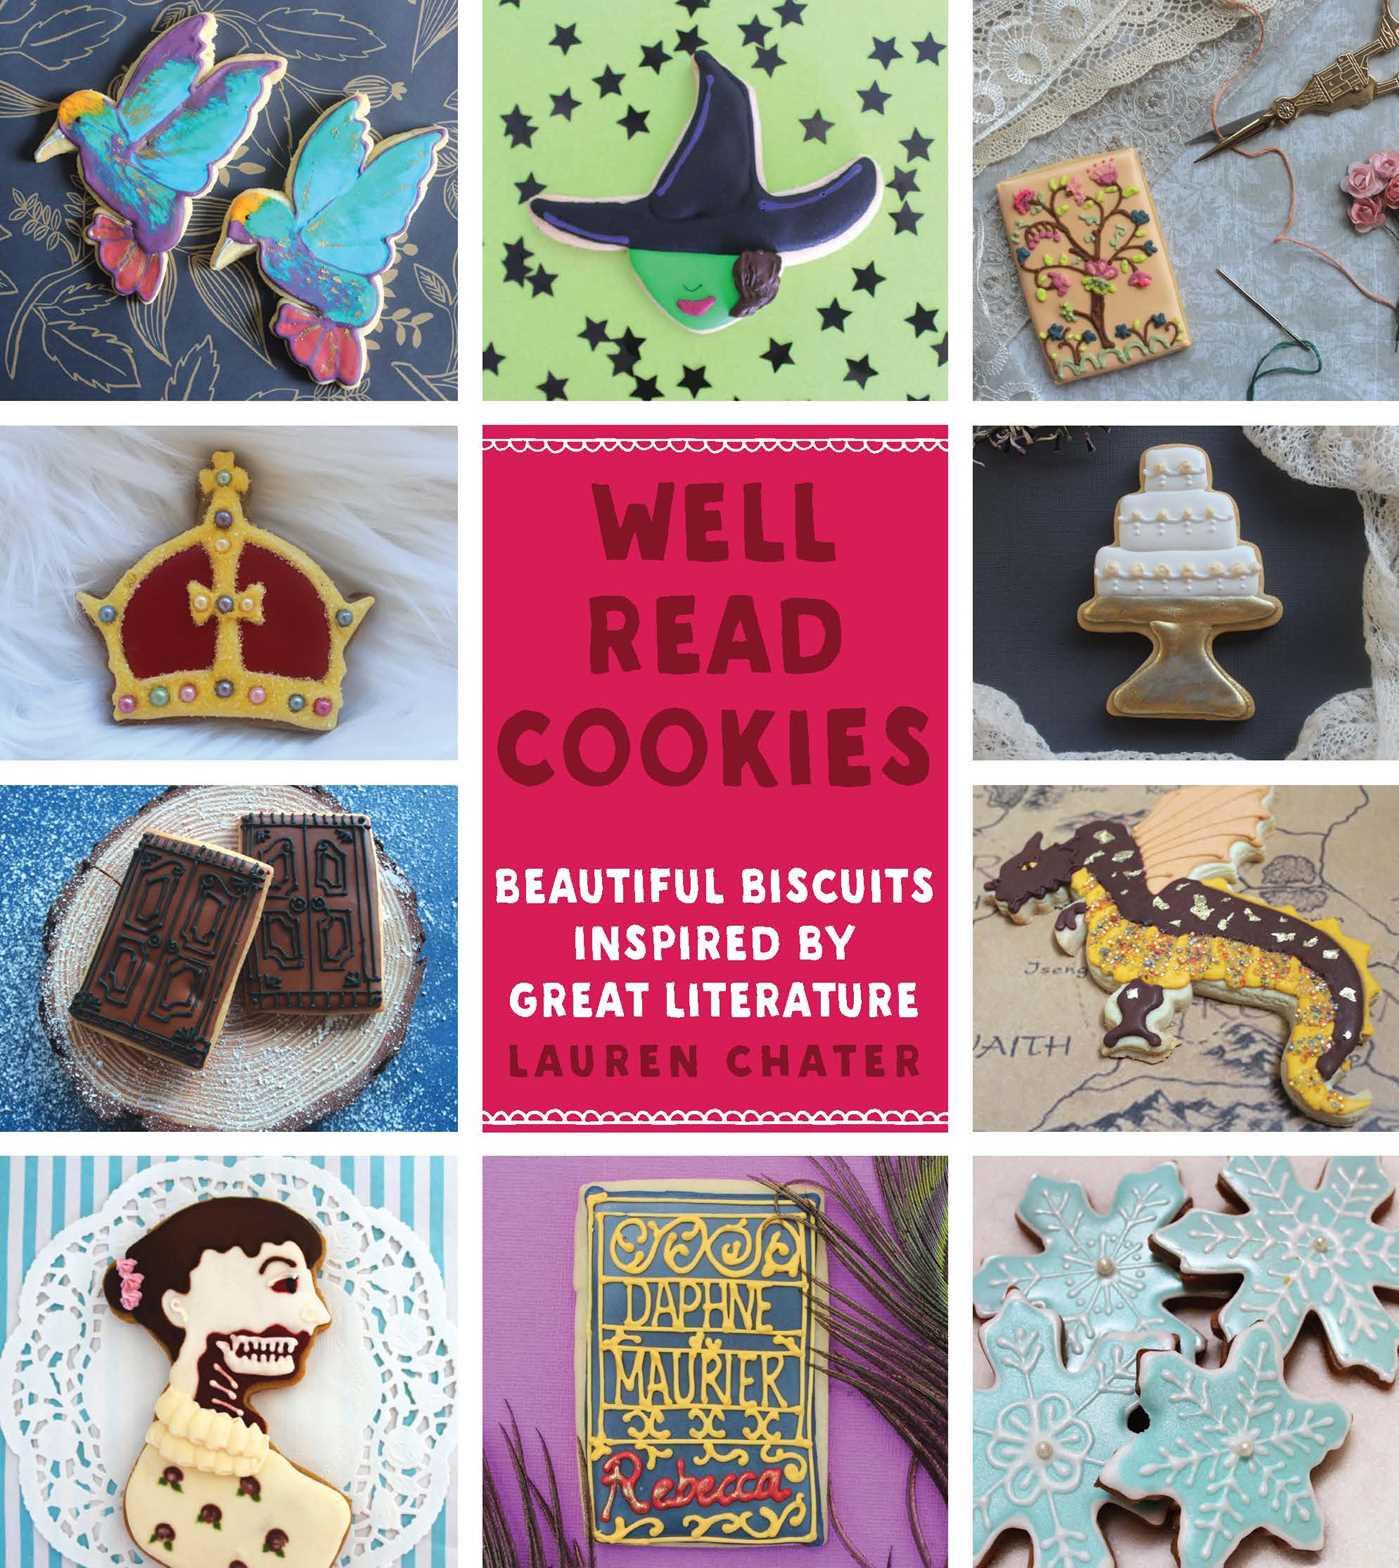 Well read cookies 9781925596366 hr